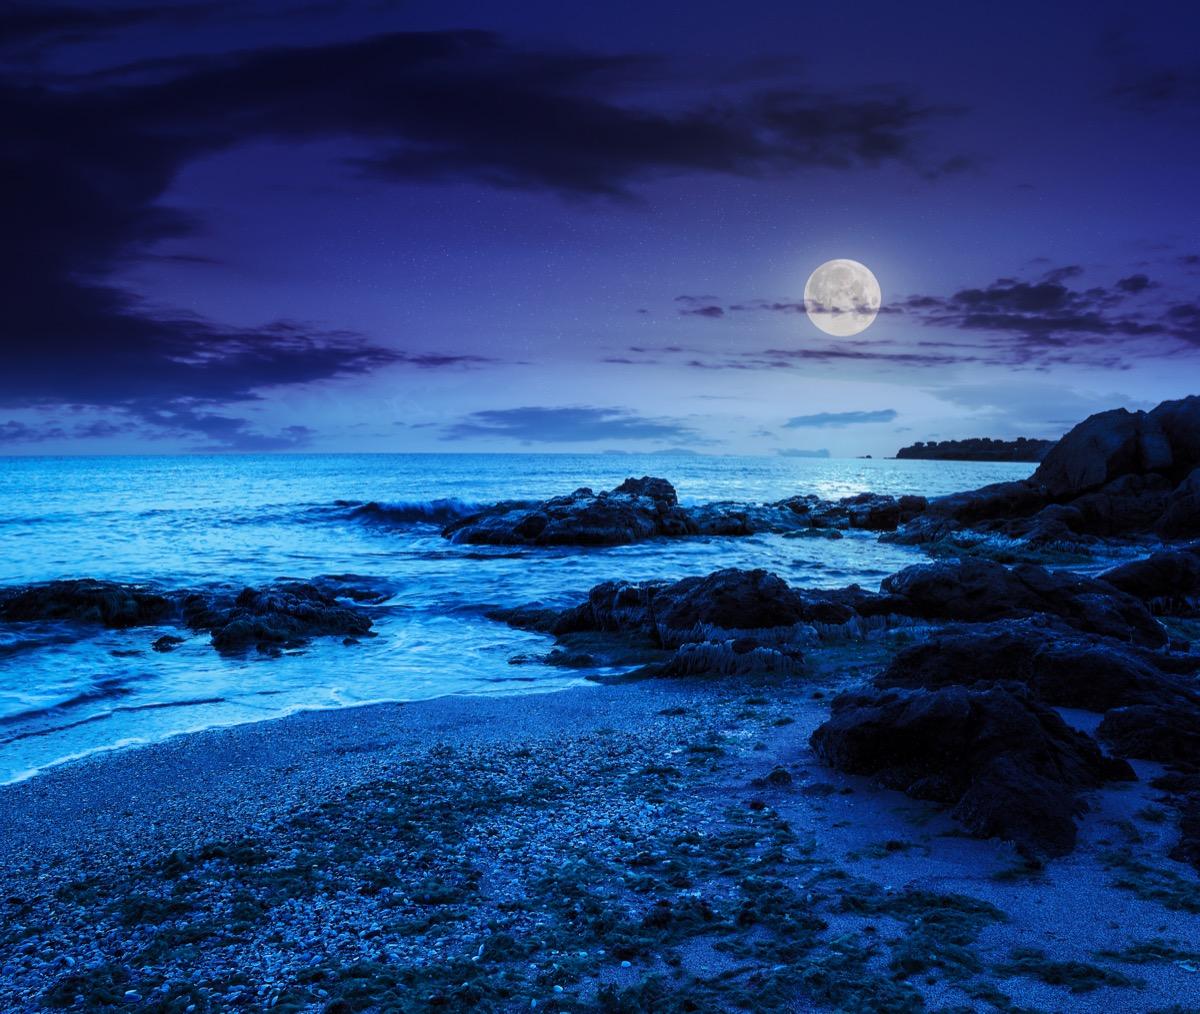 Beach shore at night